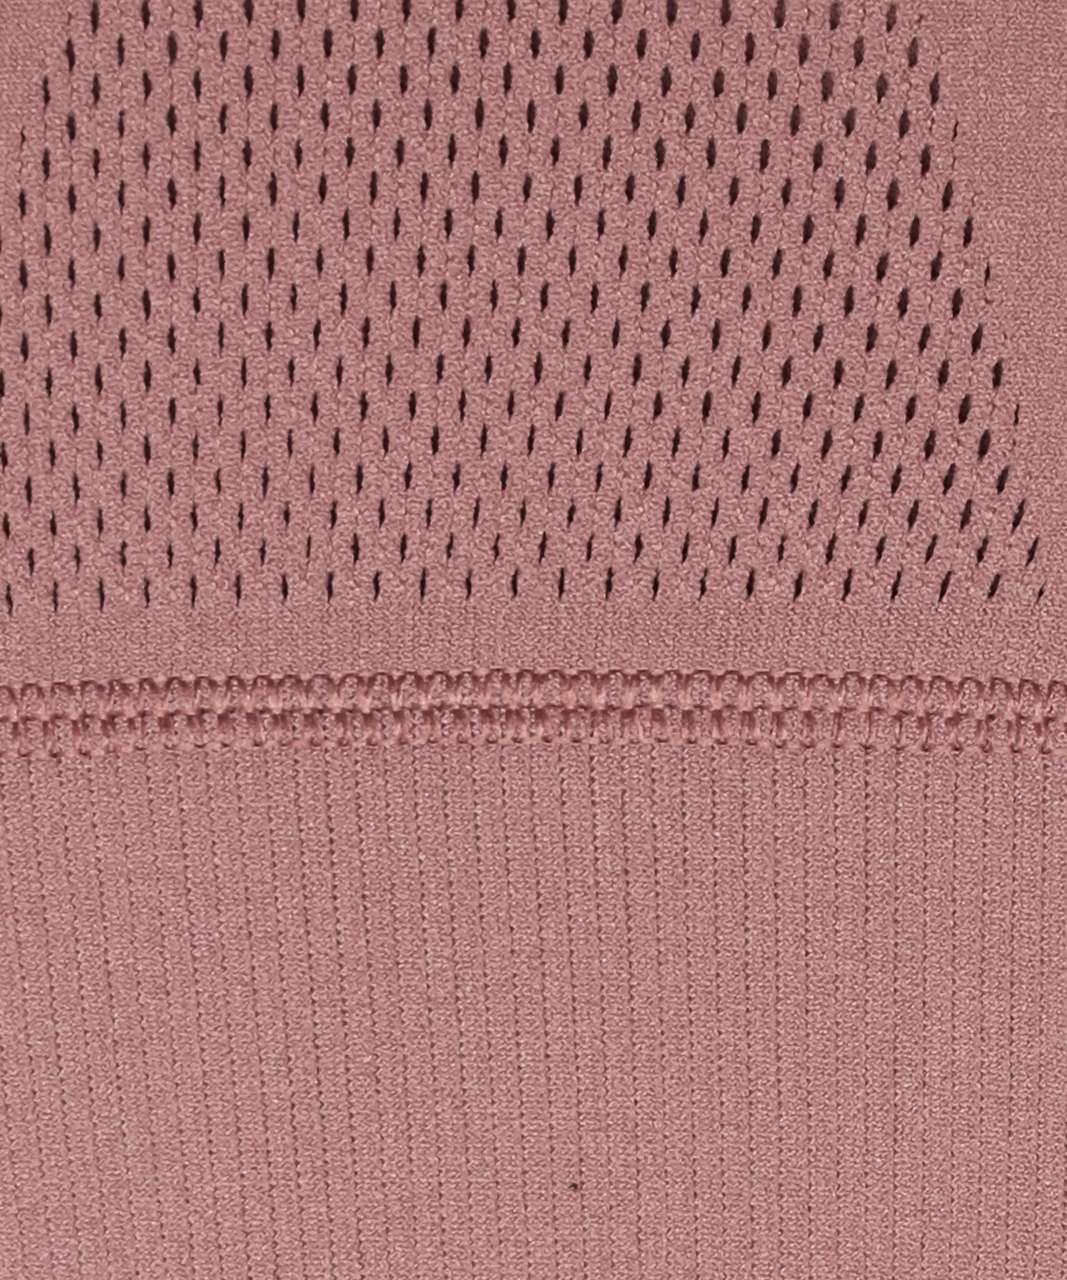 Lululemon Reveal Bra Precision *lululemon X Barrys - Red Dust